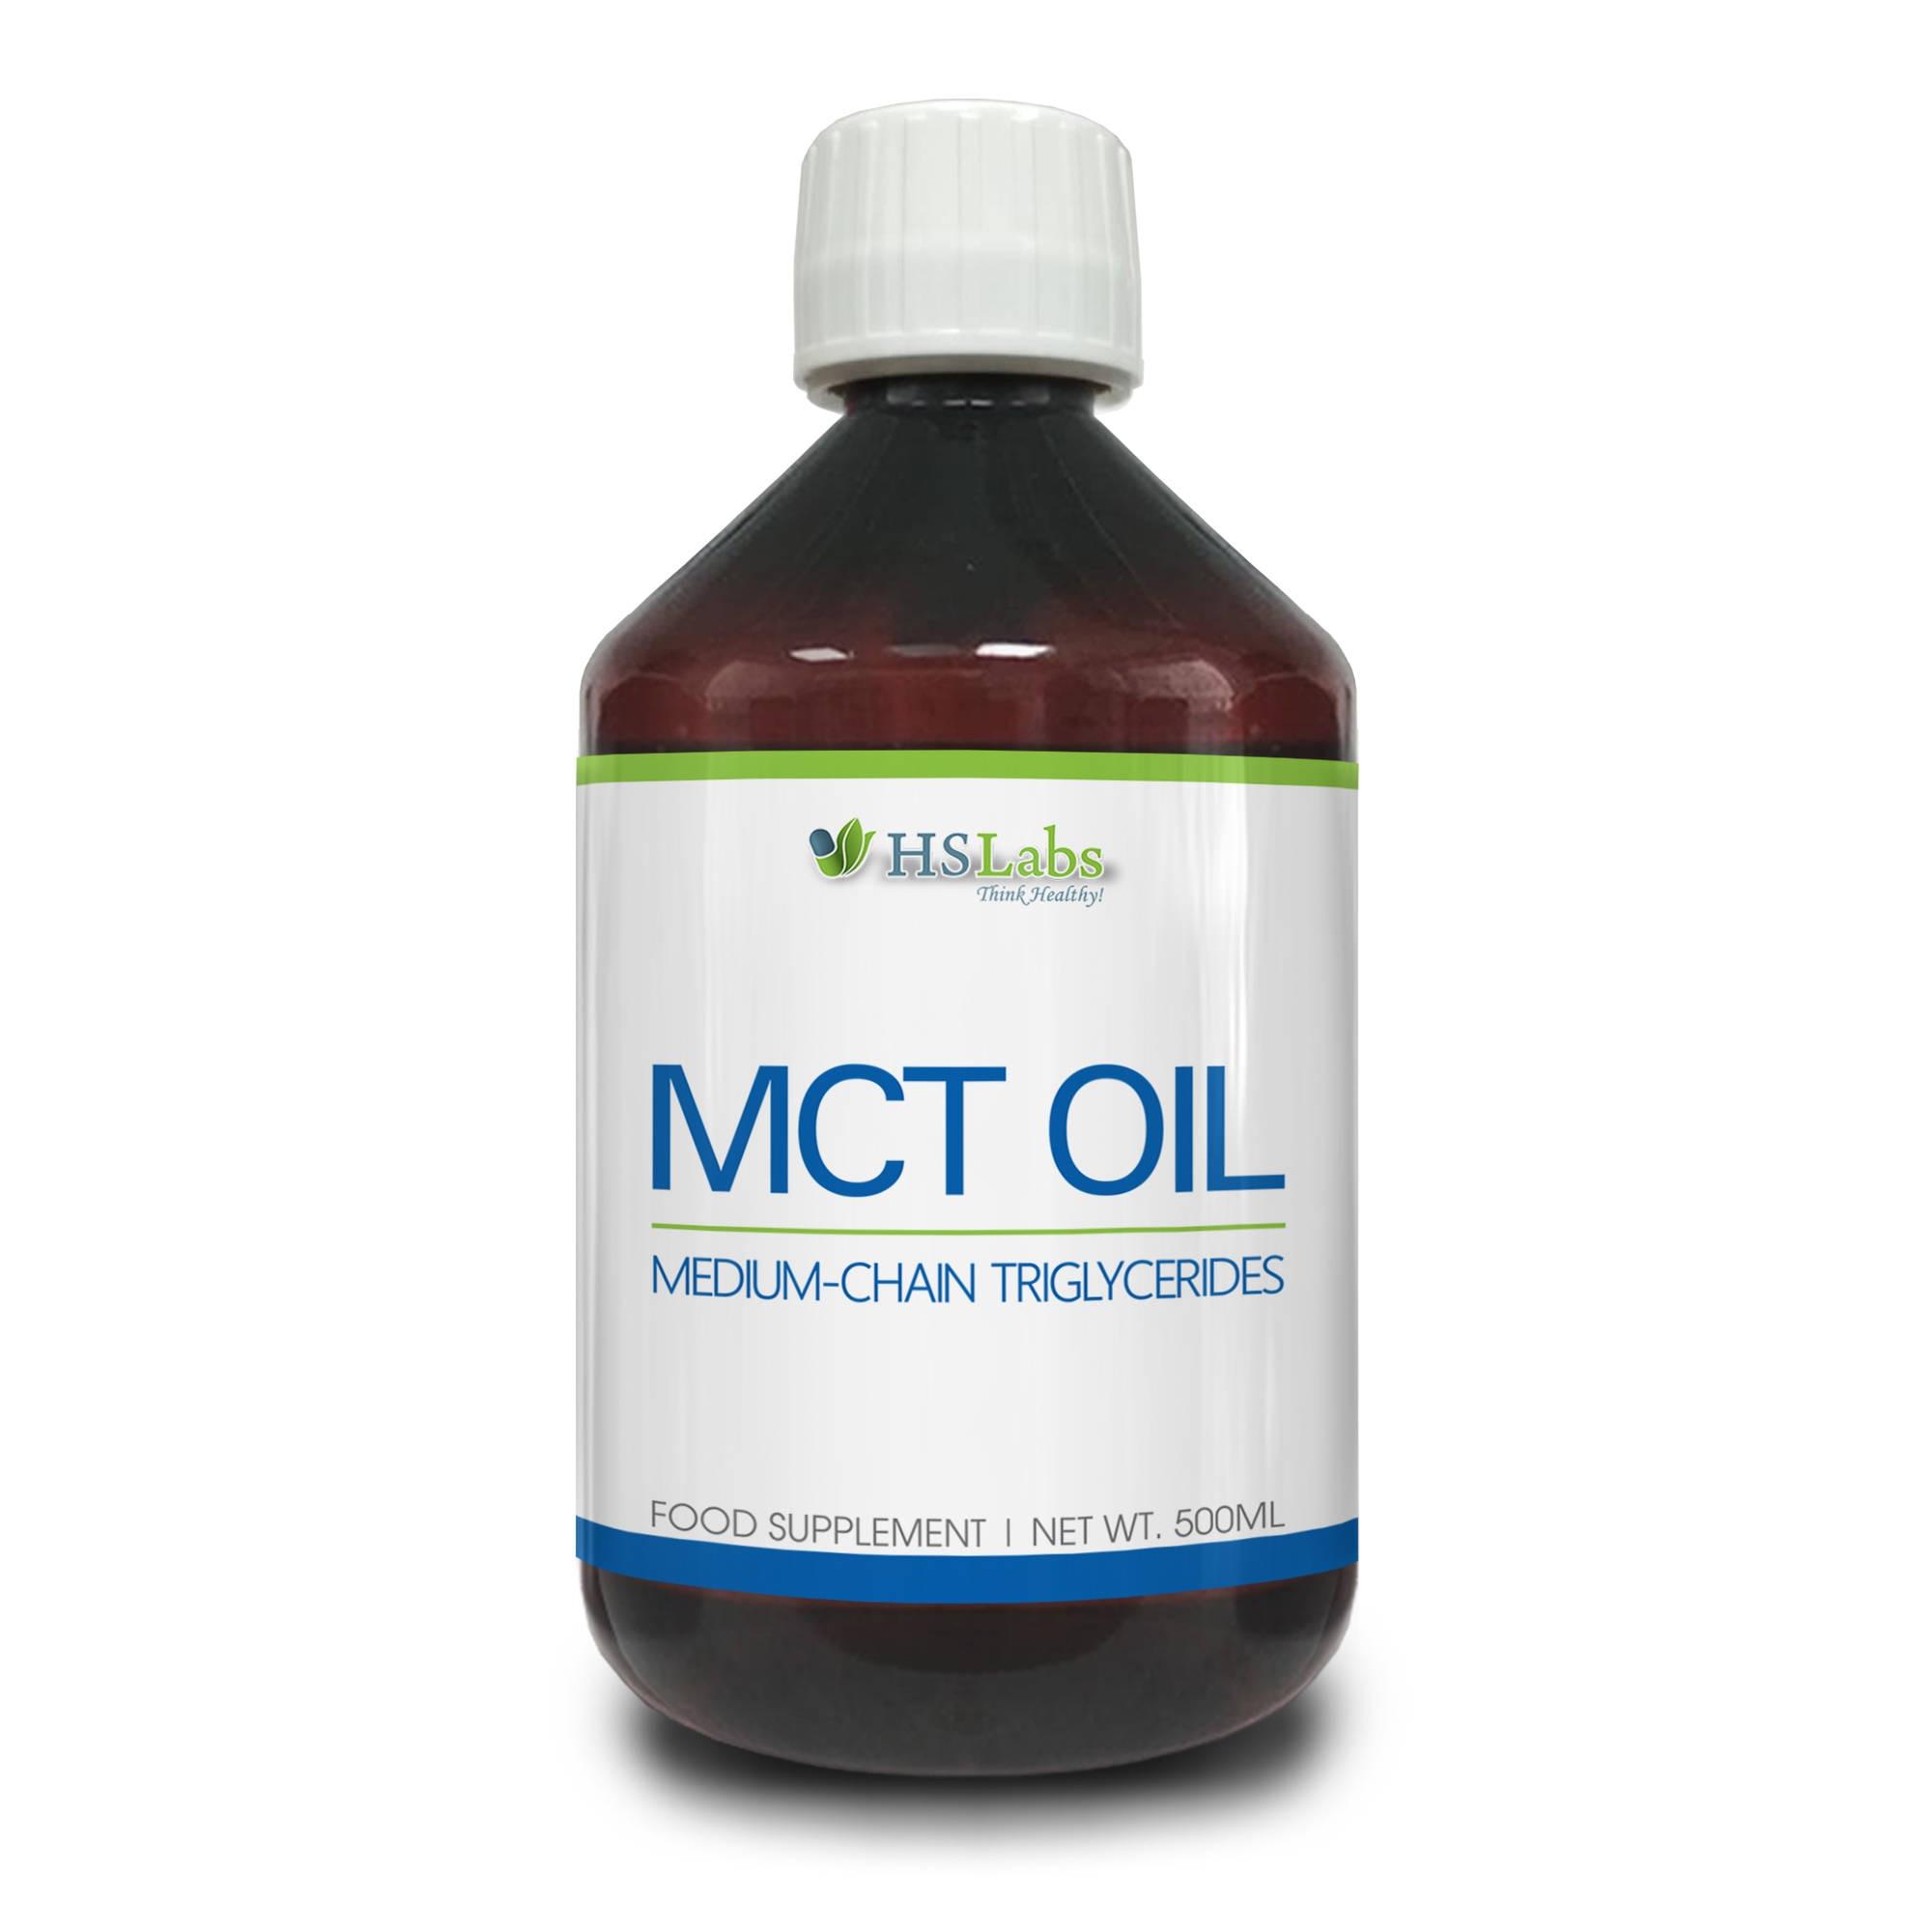 MCT OIL ml OLIMP, Ulei de MCT OIL | Produse medicale